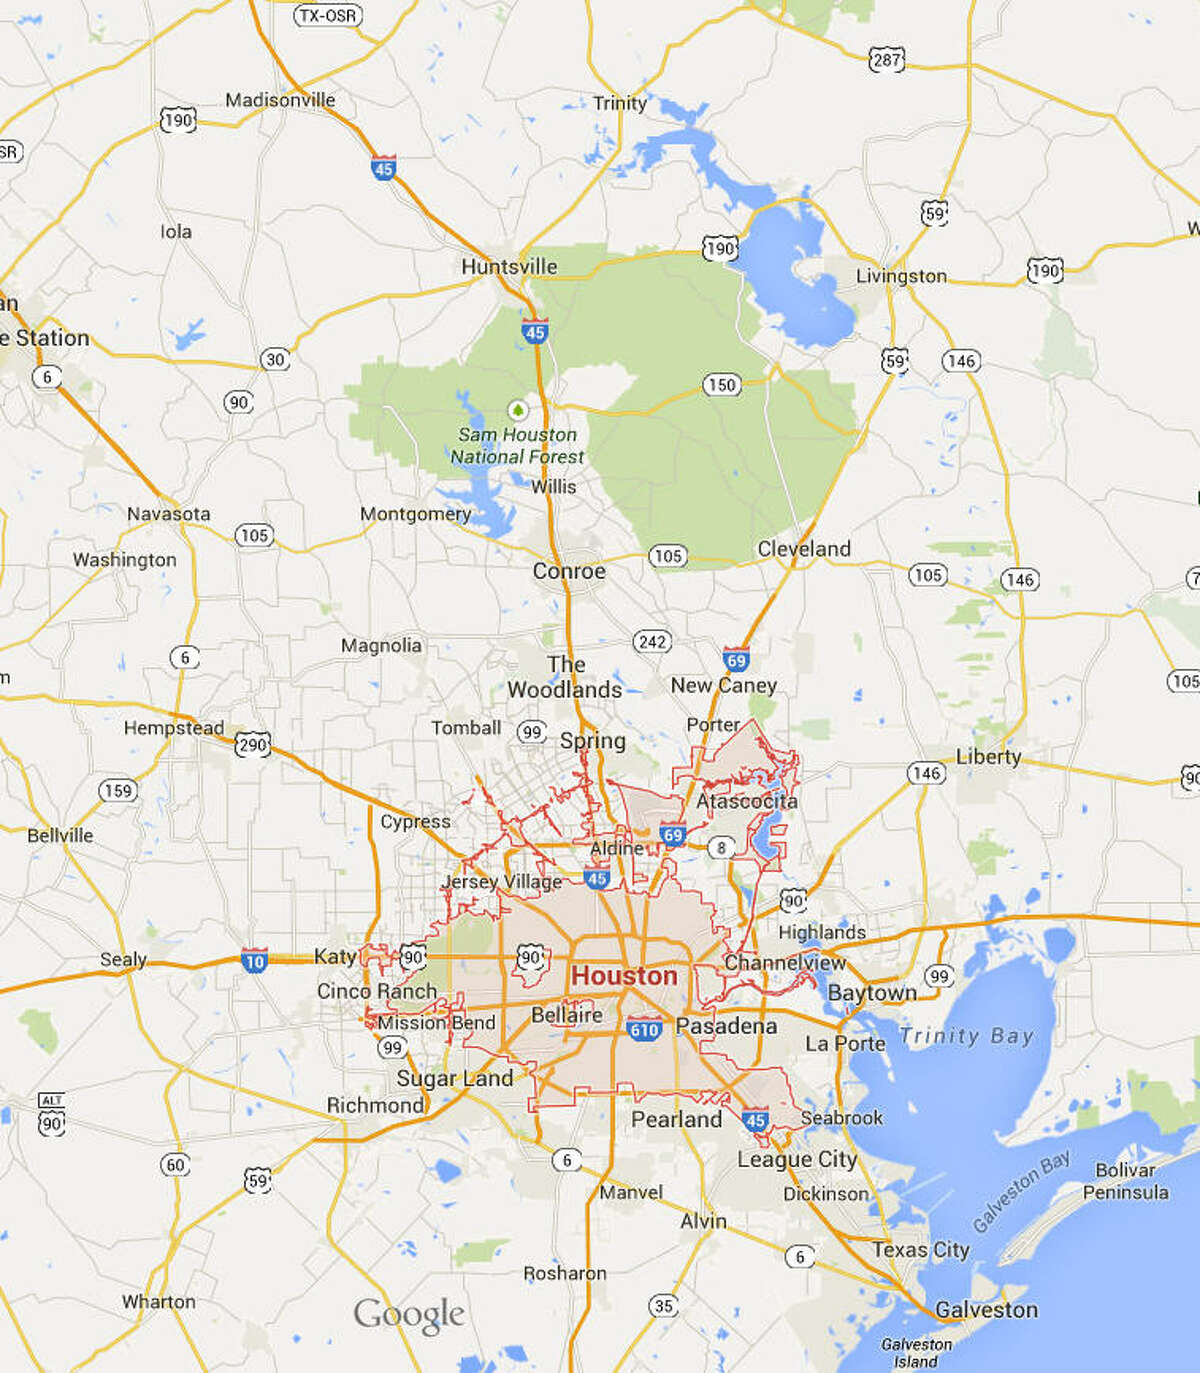 Houston Population: 2.2 million From Google Maps